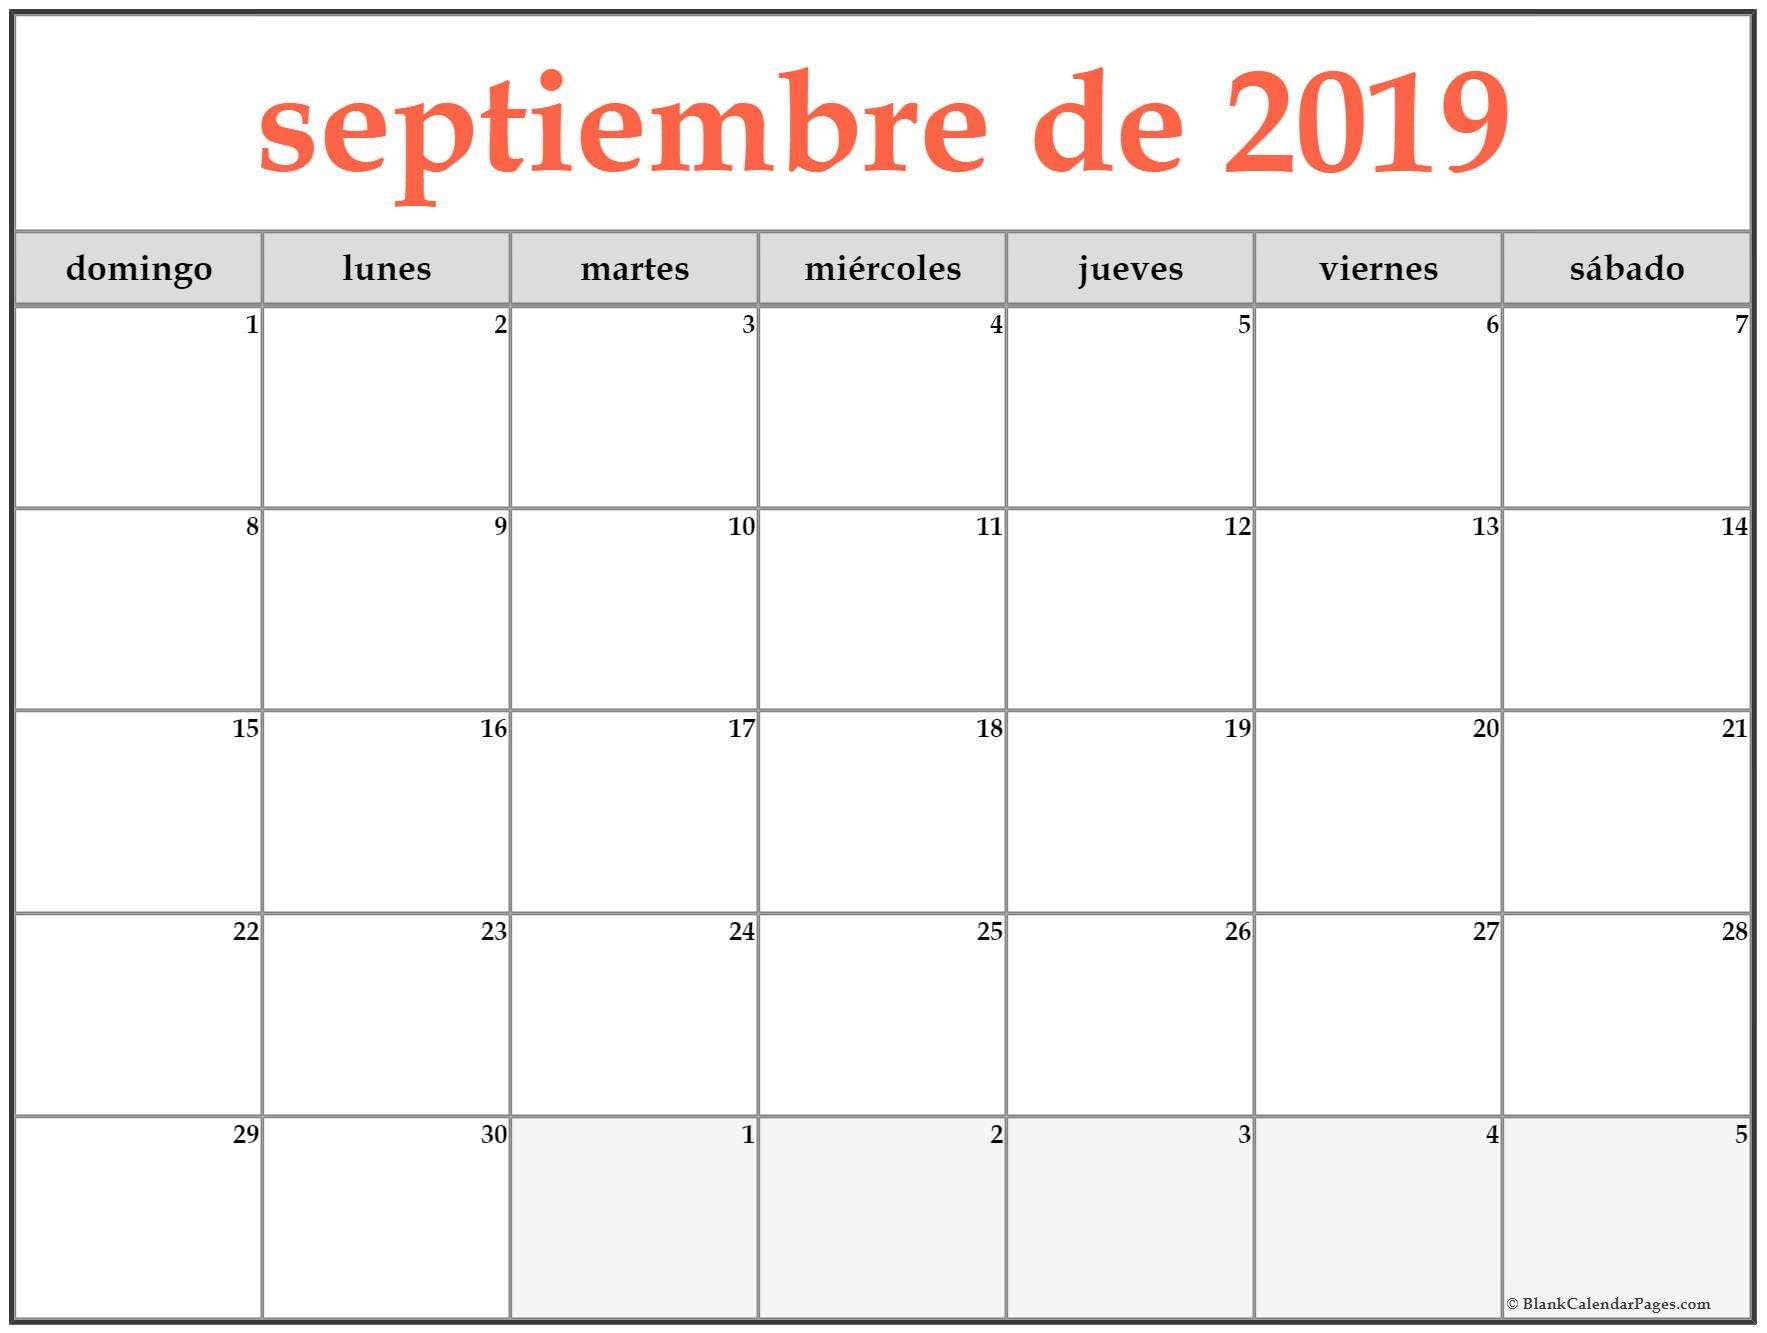 septiembre de 2019 calendario para imprimir